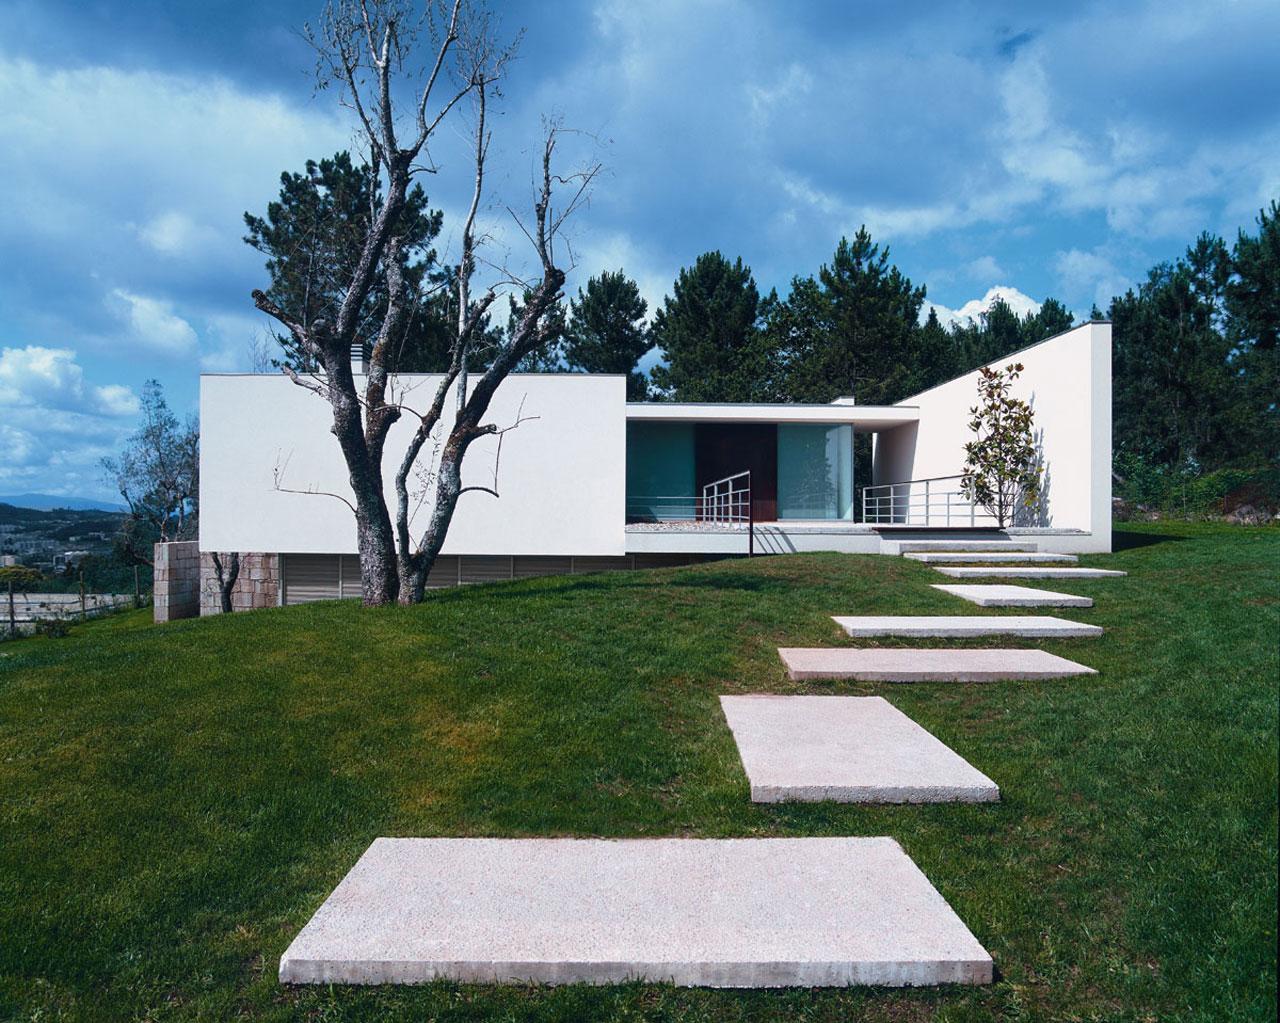 Casa Lote 9 Fraião / Topos Atelier de Arquitectura, © Xavier Antunes